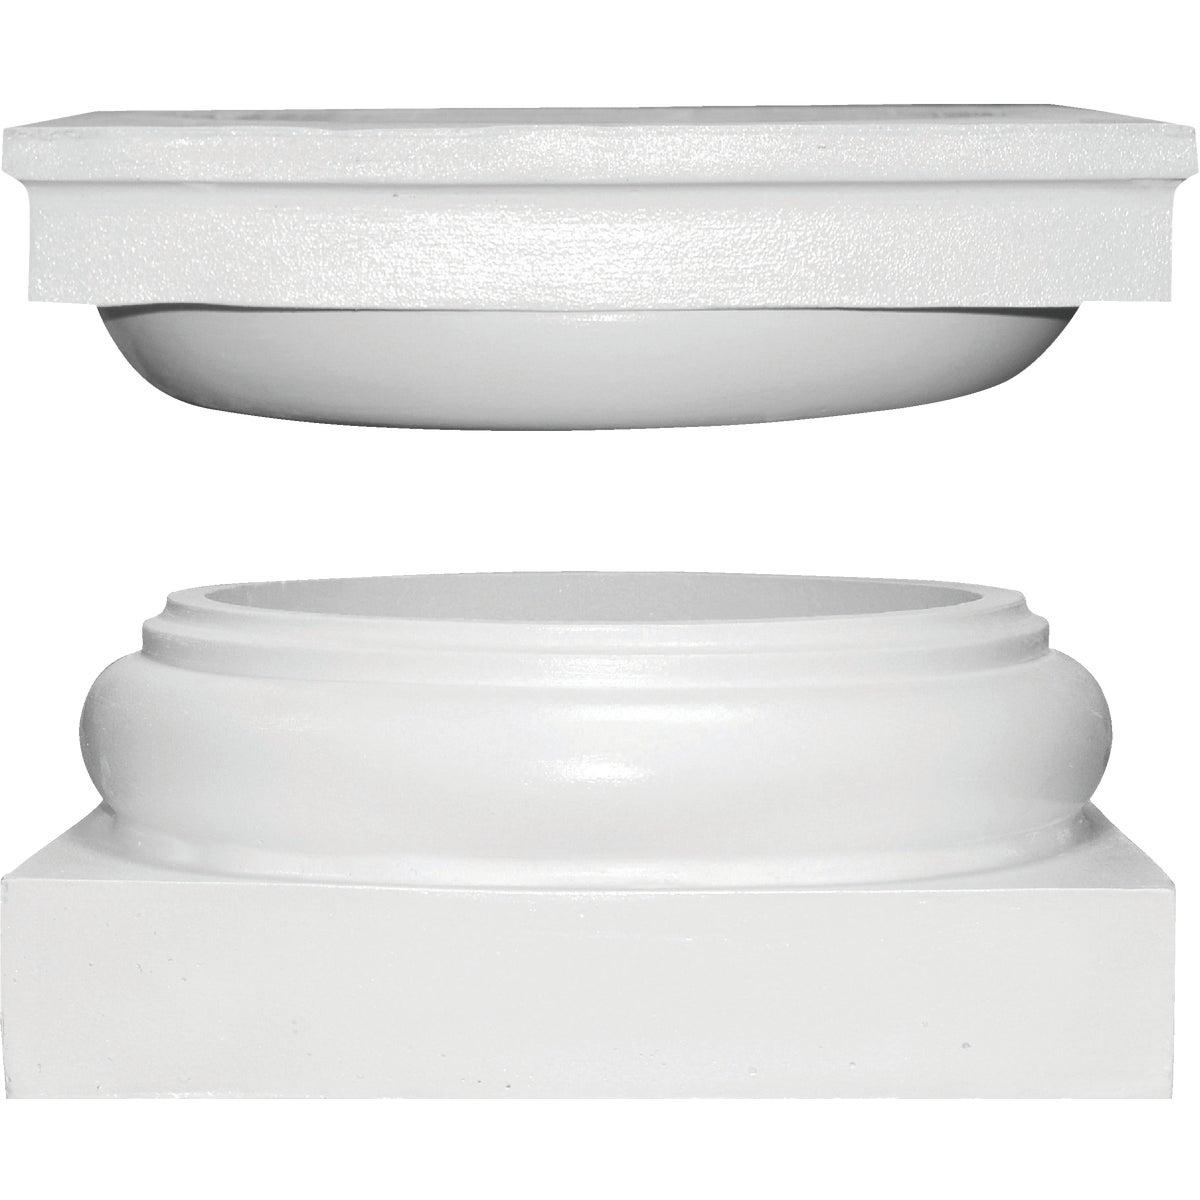 Round Cap & Base Set